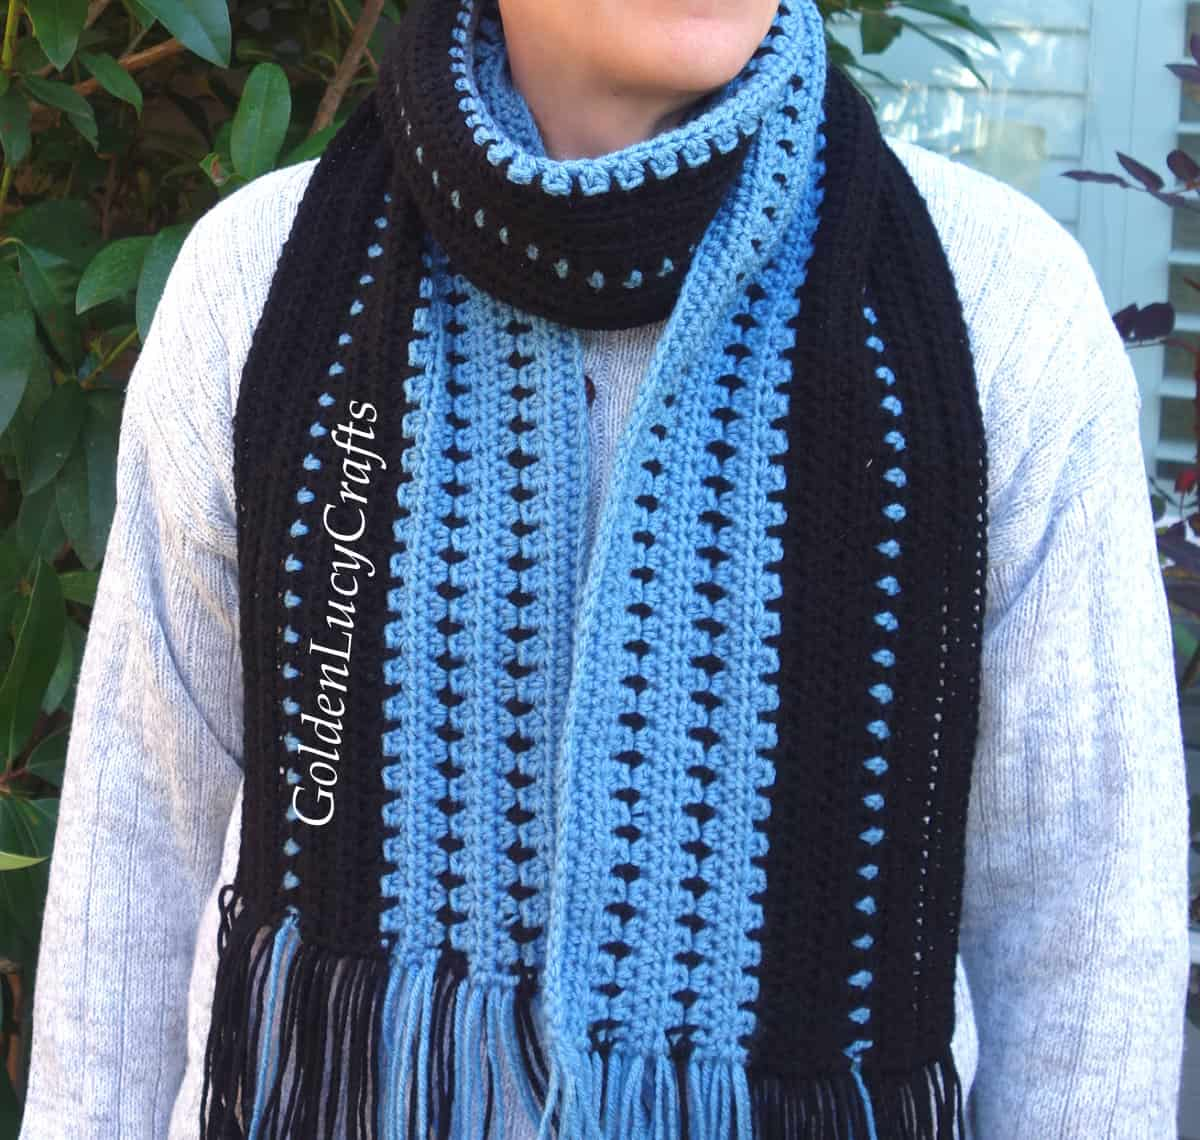 Man dressed in handmade scarf.